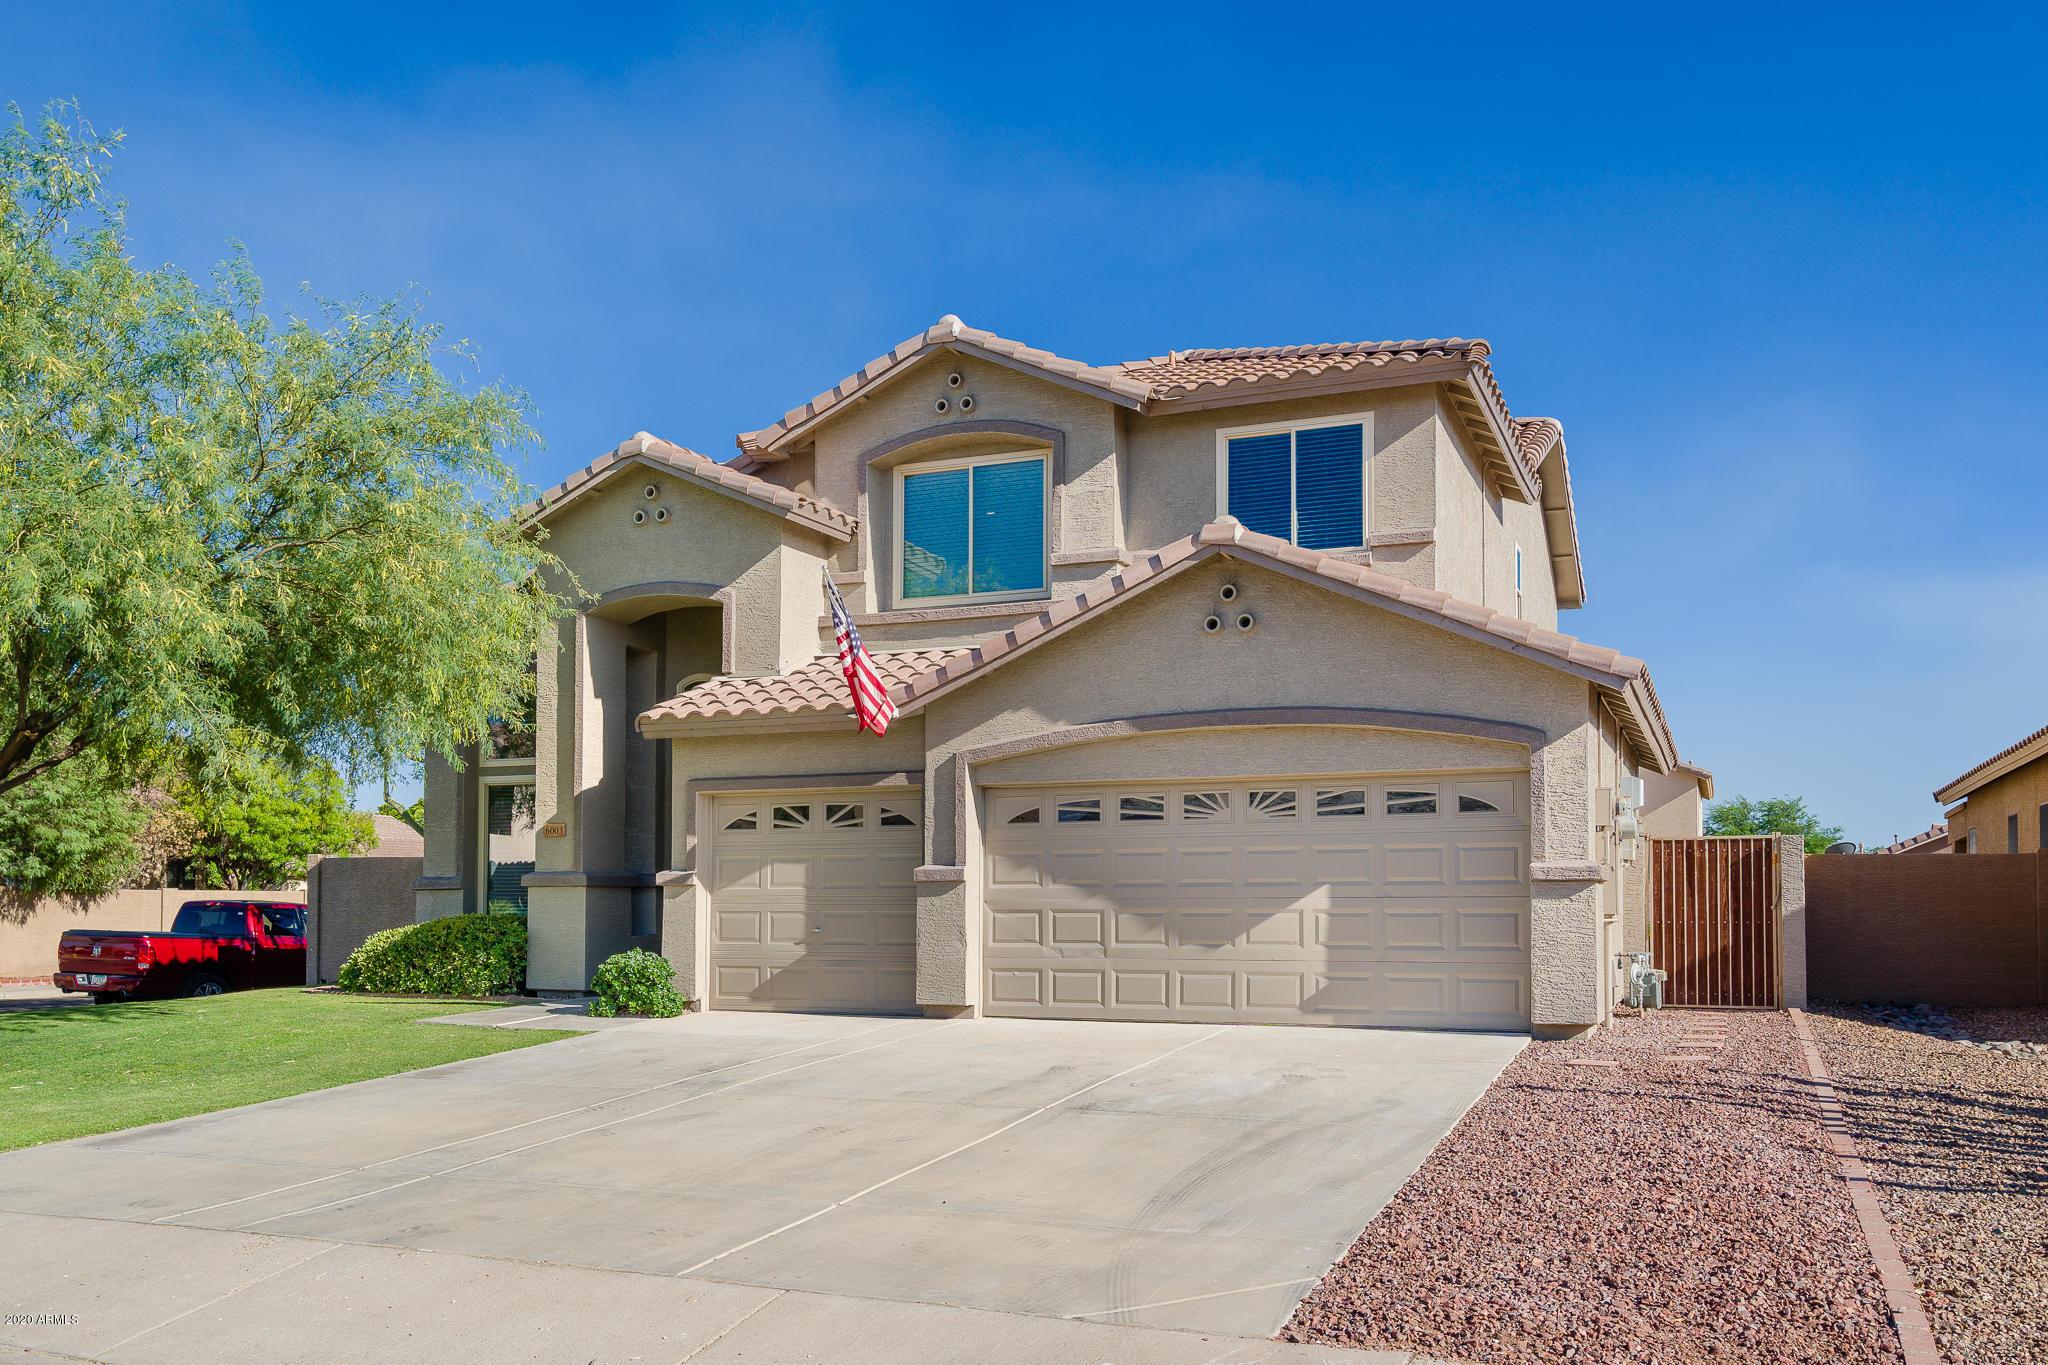 Photo of 6003 W SACK Drive, Glendale, AZ 85308